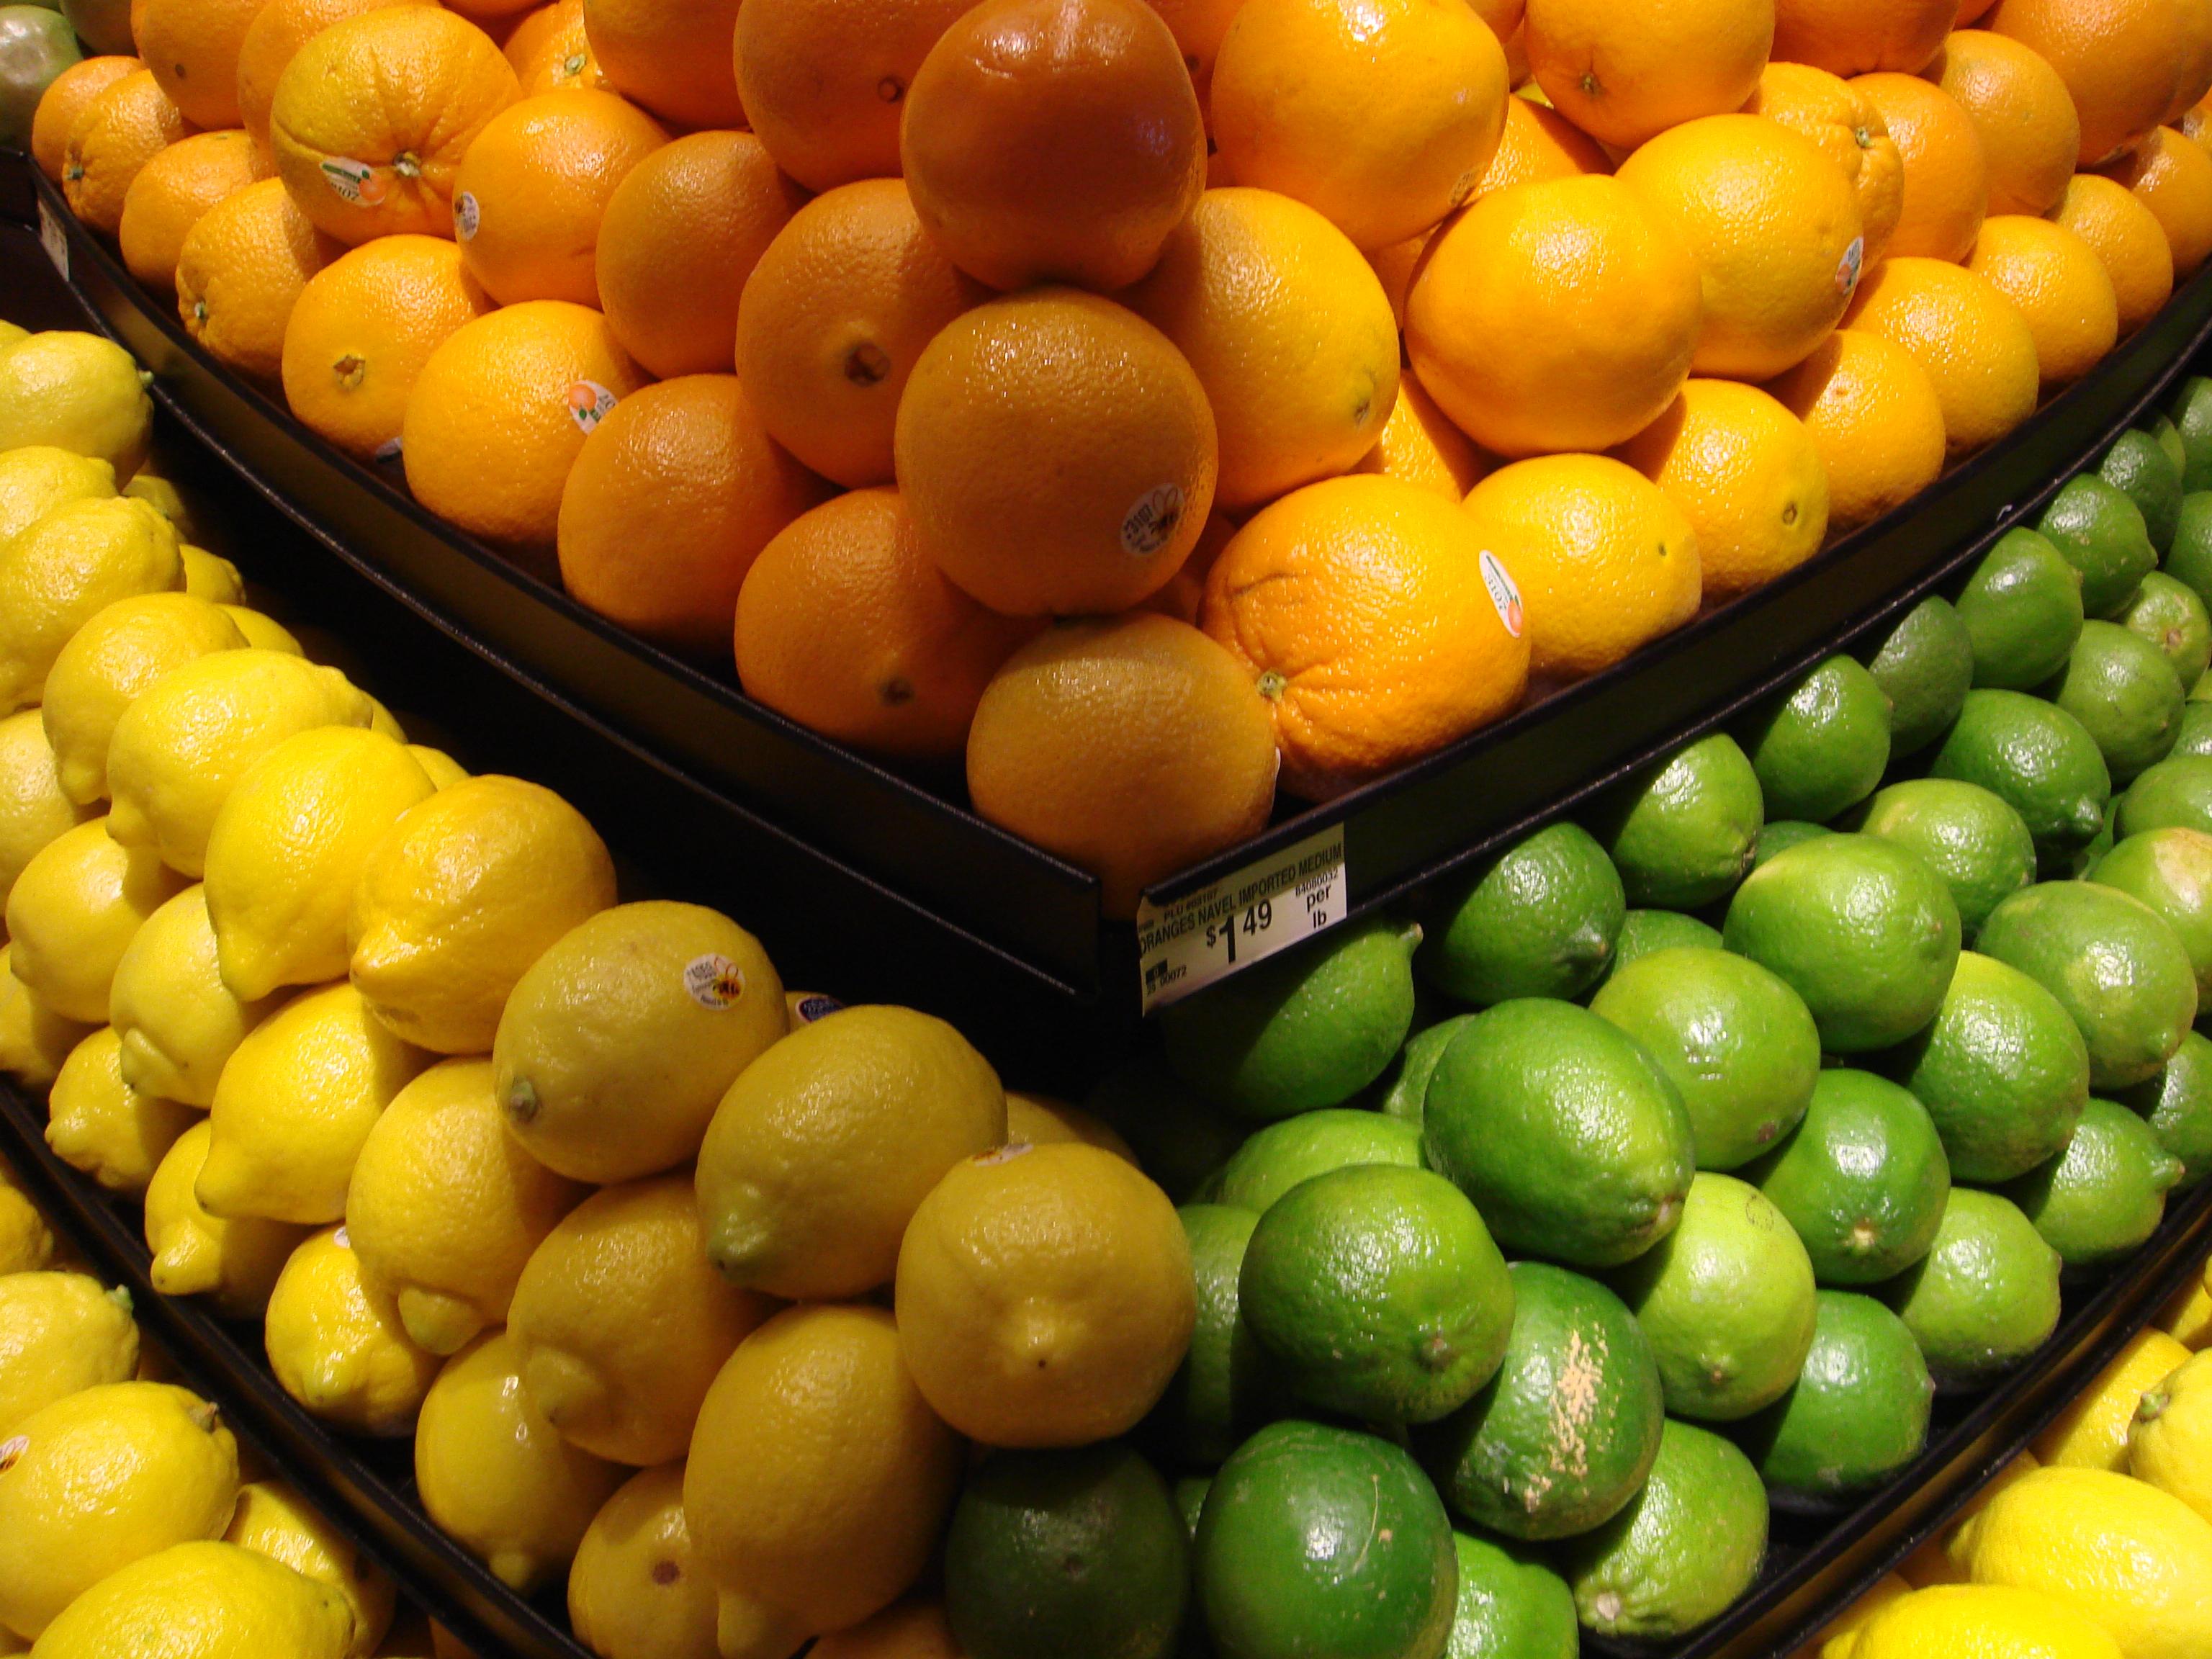 http://upload.wikimedia.org/wikipedia/commons/b/b1/Lemon,_Lime_and_Orange.jpg